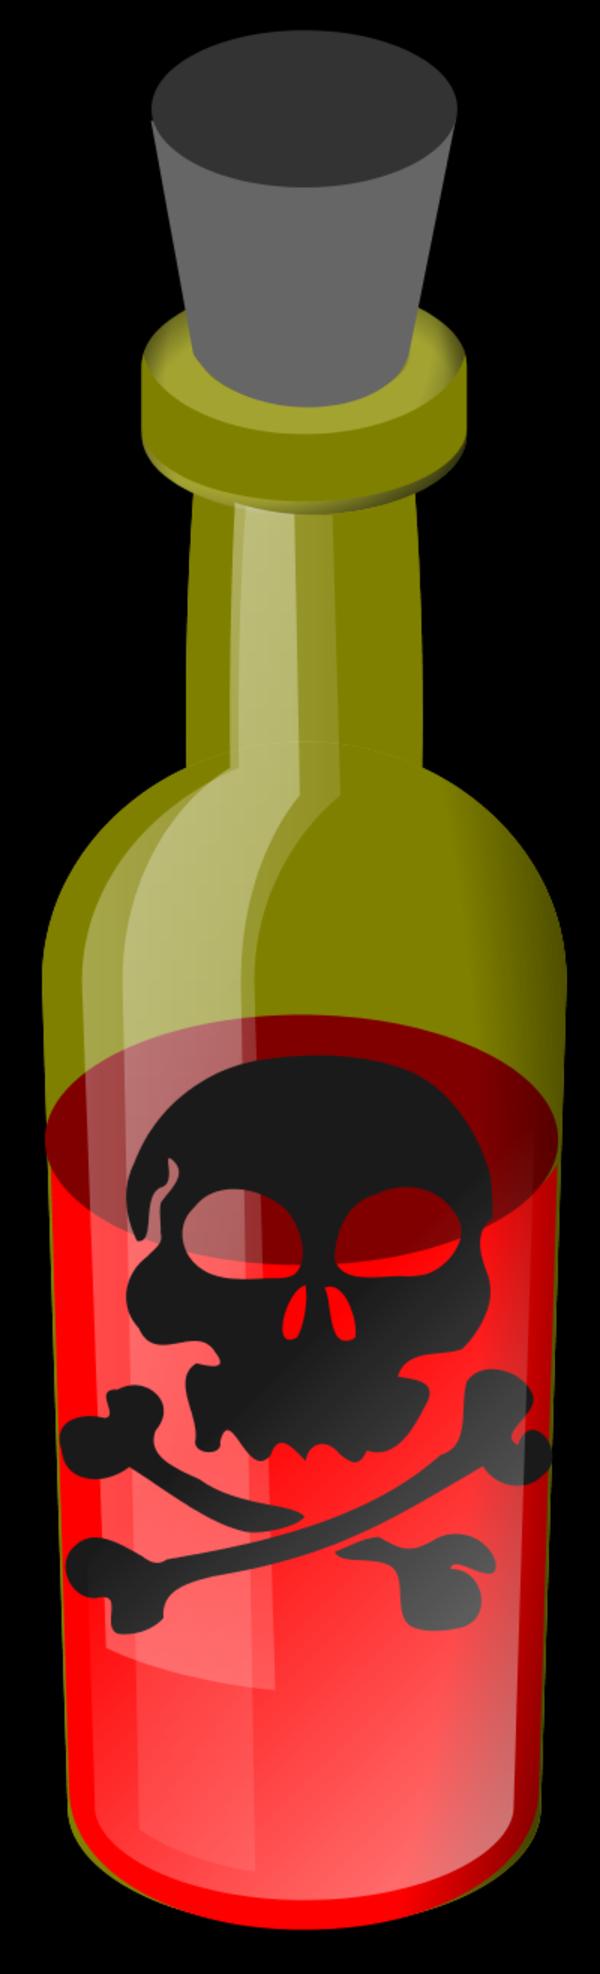 Poison Bottle Clipart.